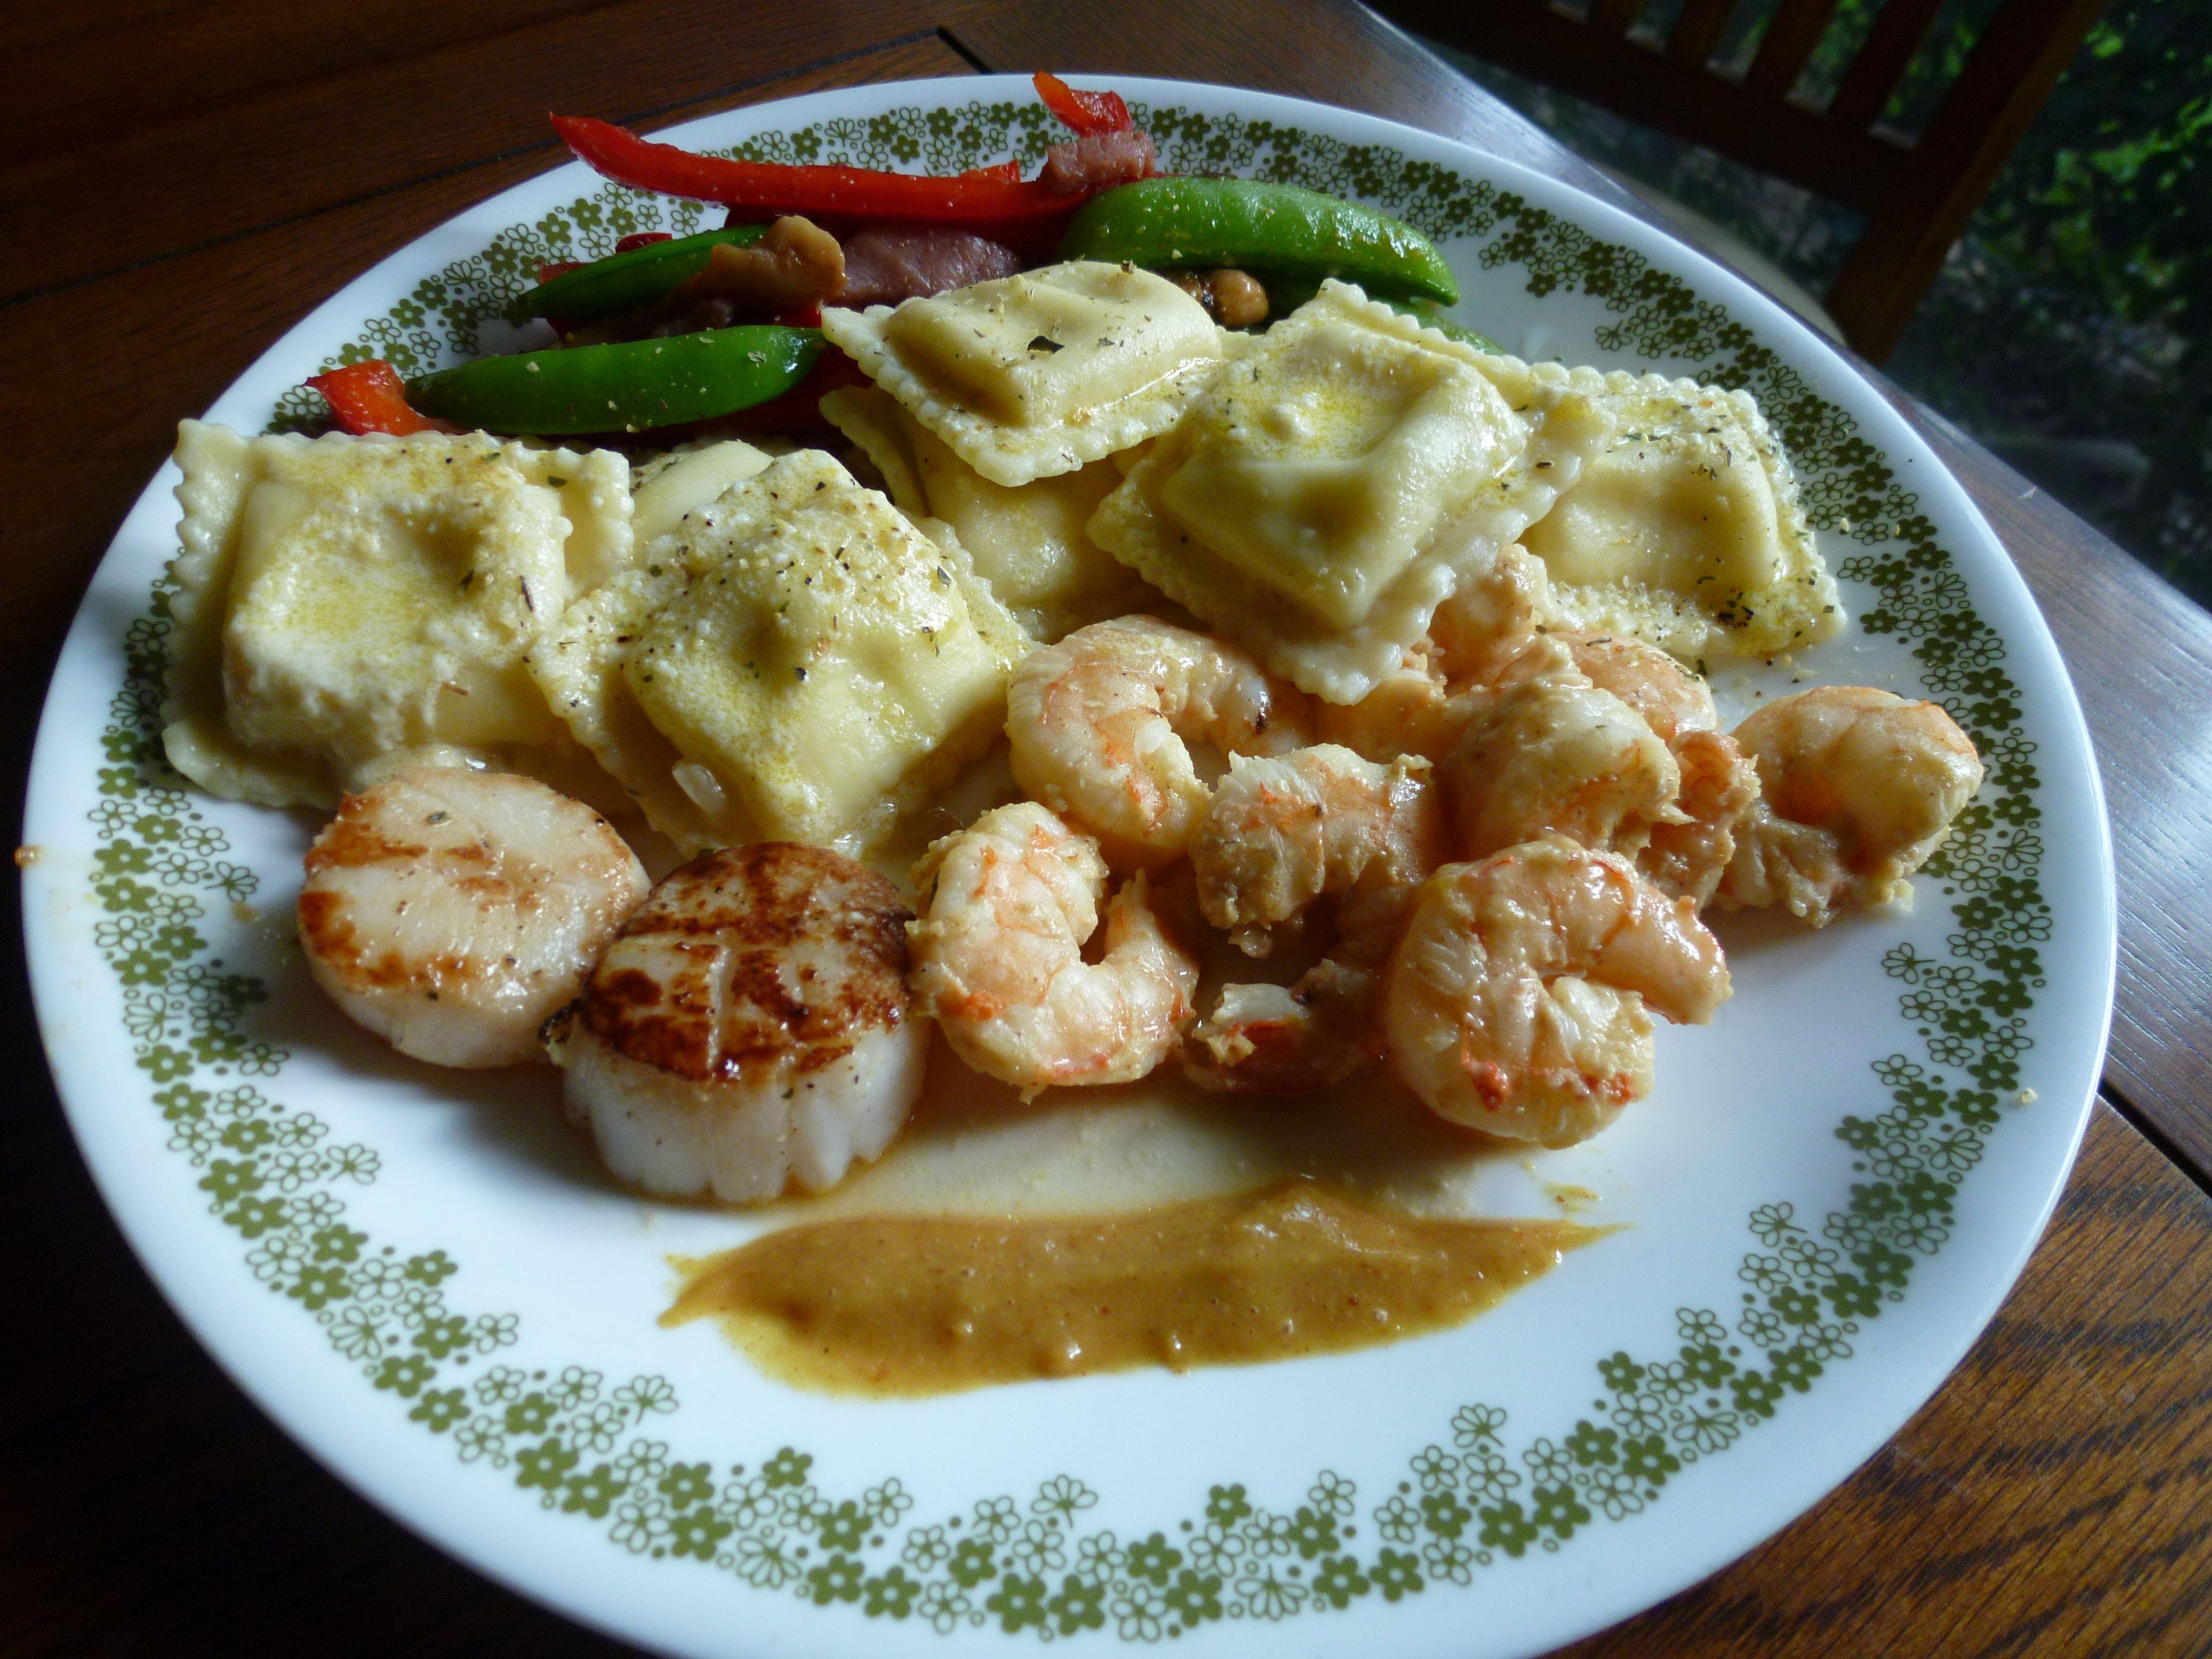 shrimp, seared scallops, cheese ravioli and sauteed sugar snap peas ...